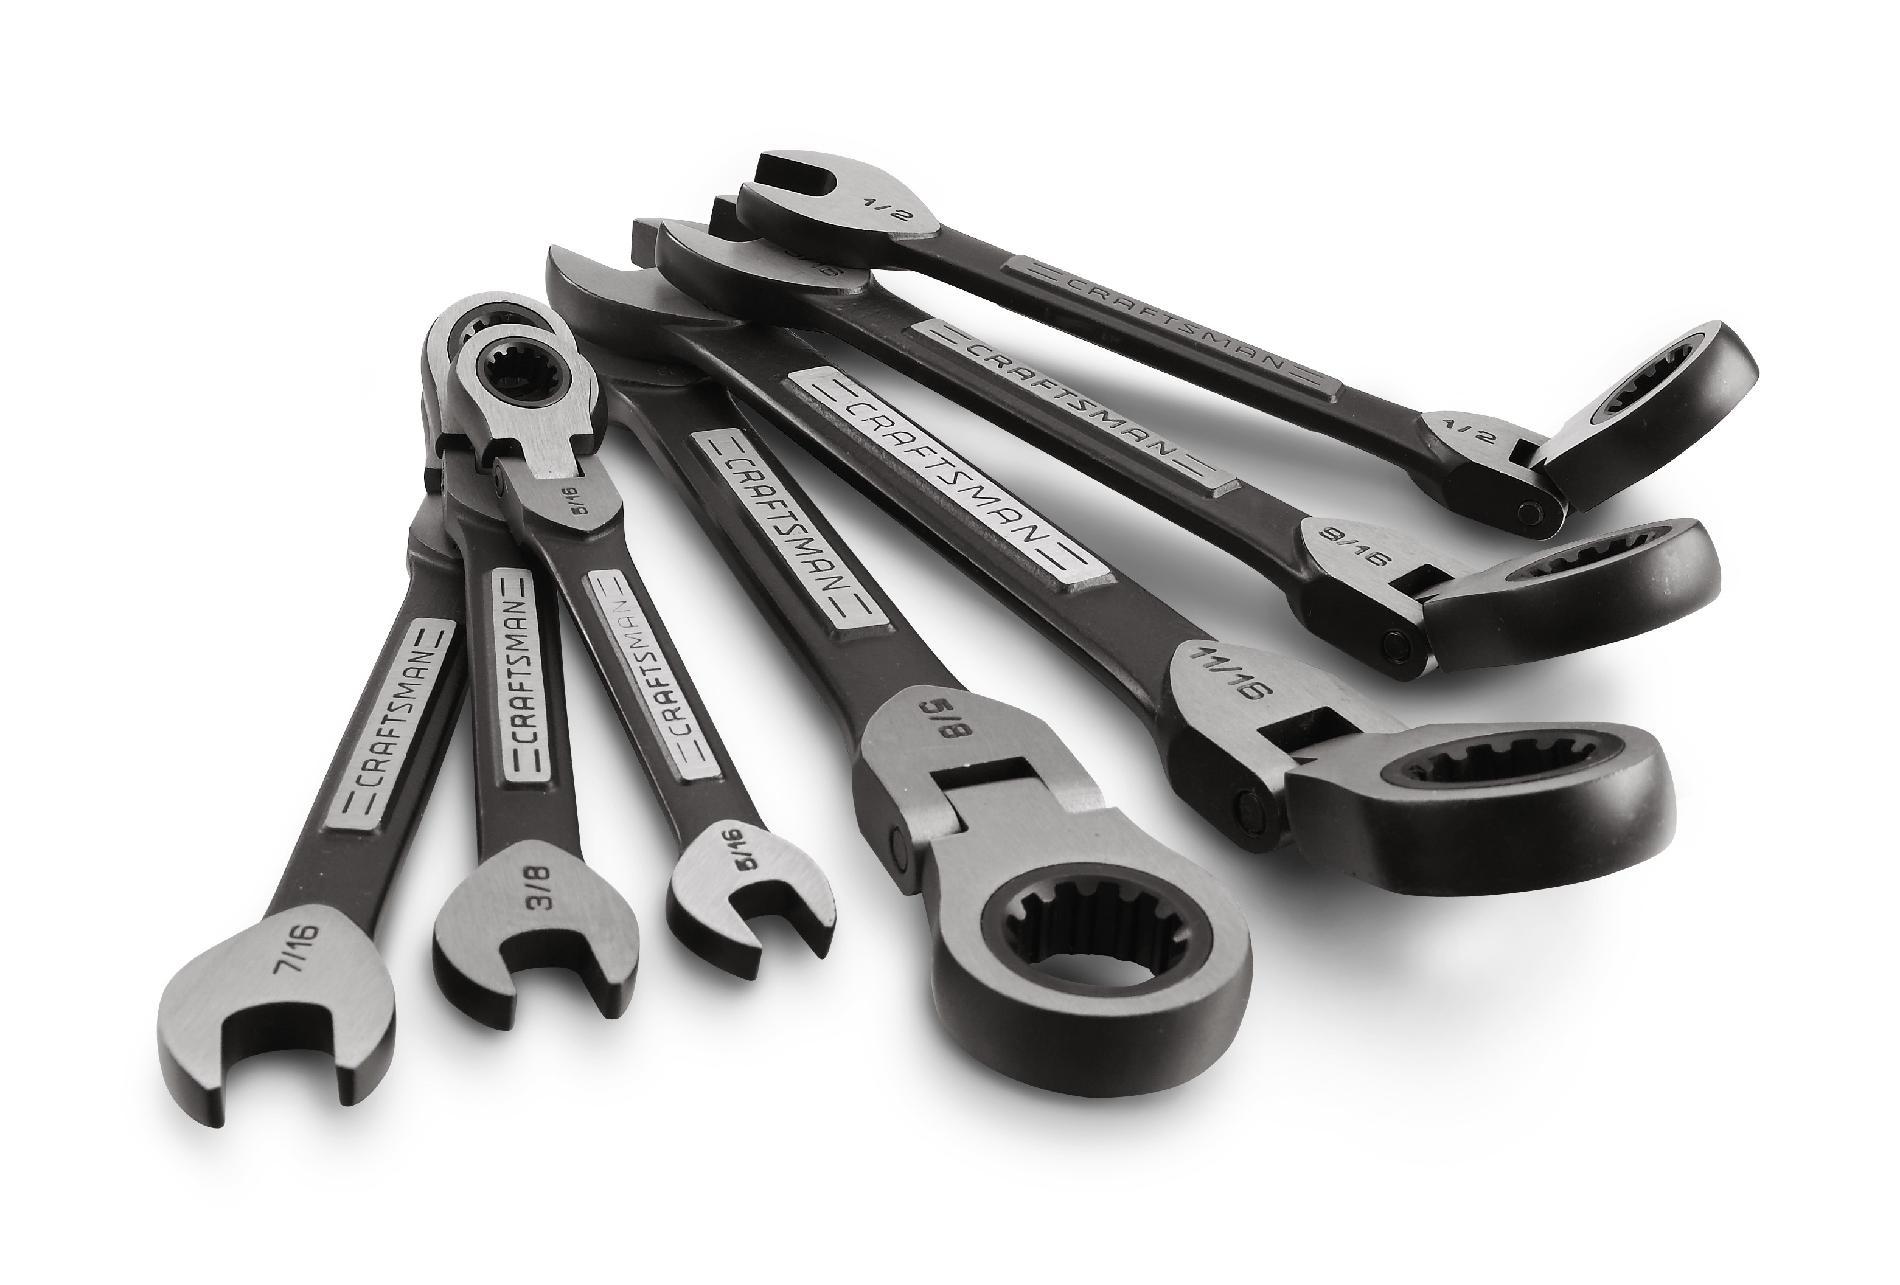 Craftsman 7PC Universal Flex Ratcheting Wrench Set, SAE